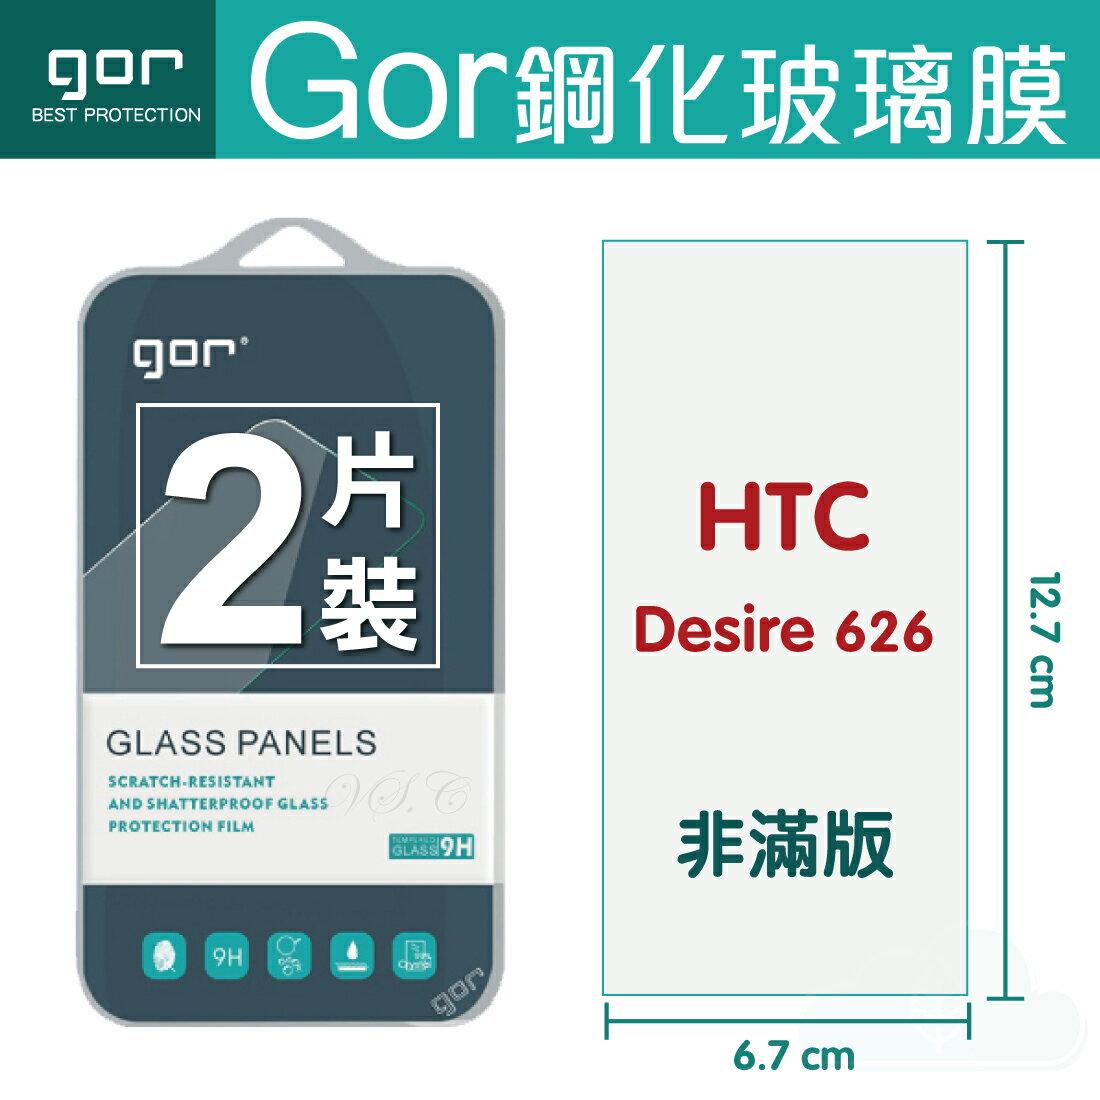 【HTC】GOR 9H HTC Desire 626 鋼化 玻璃 保護貼 全透明非滿版 兩片裝 【全館滿299免運費】